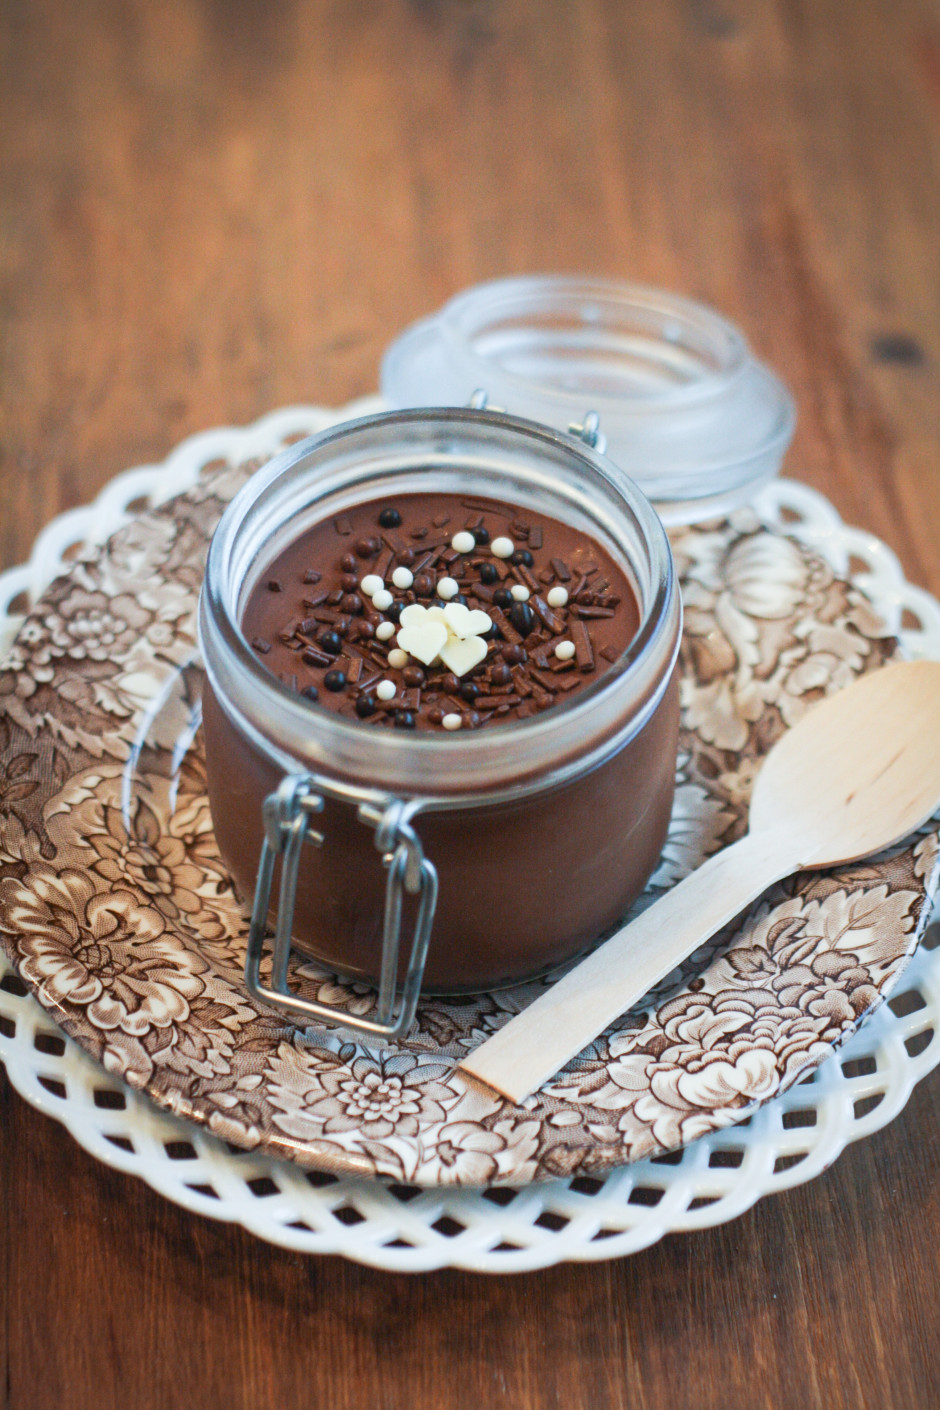 mousse al cioccolato fondente e acqua 940x1410 Mousse al cioccolato fondente allacqua